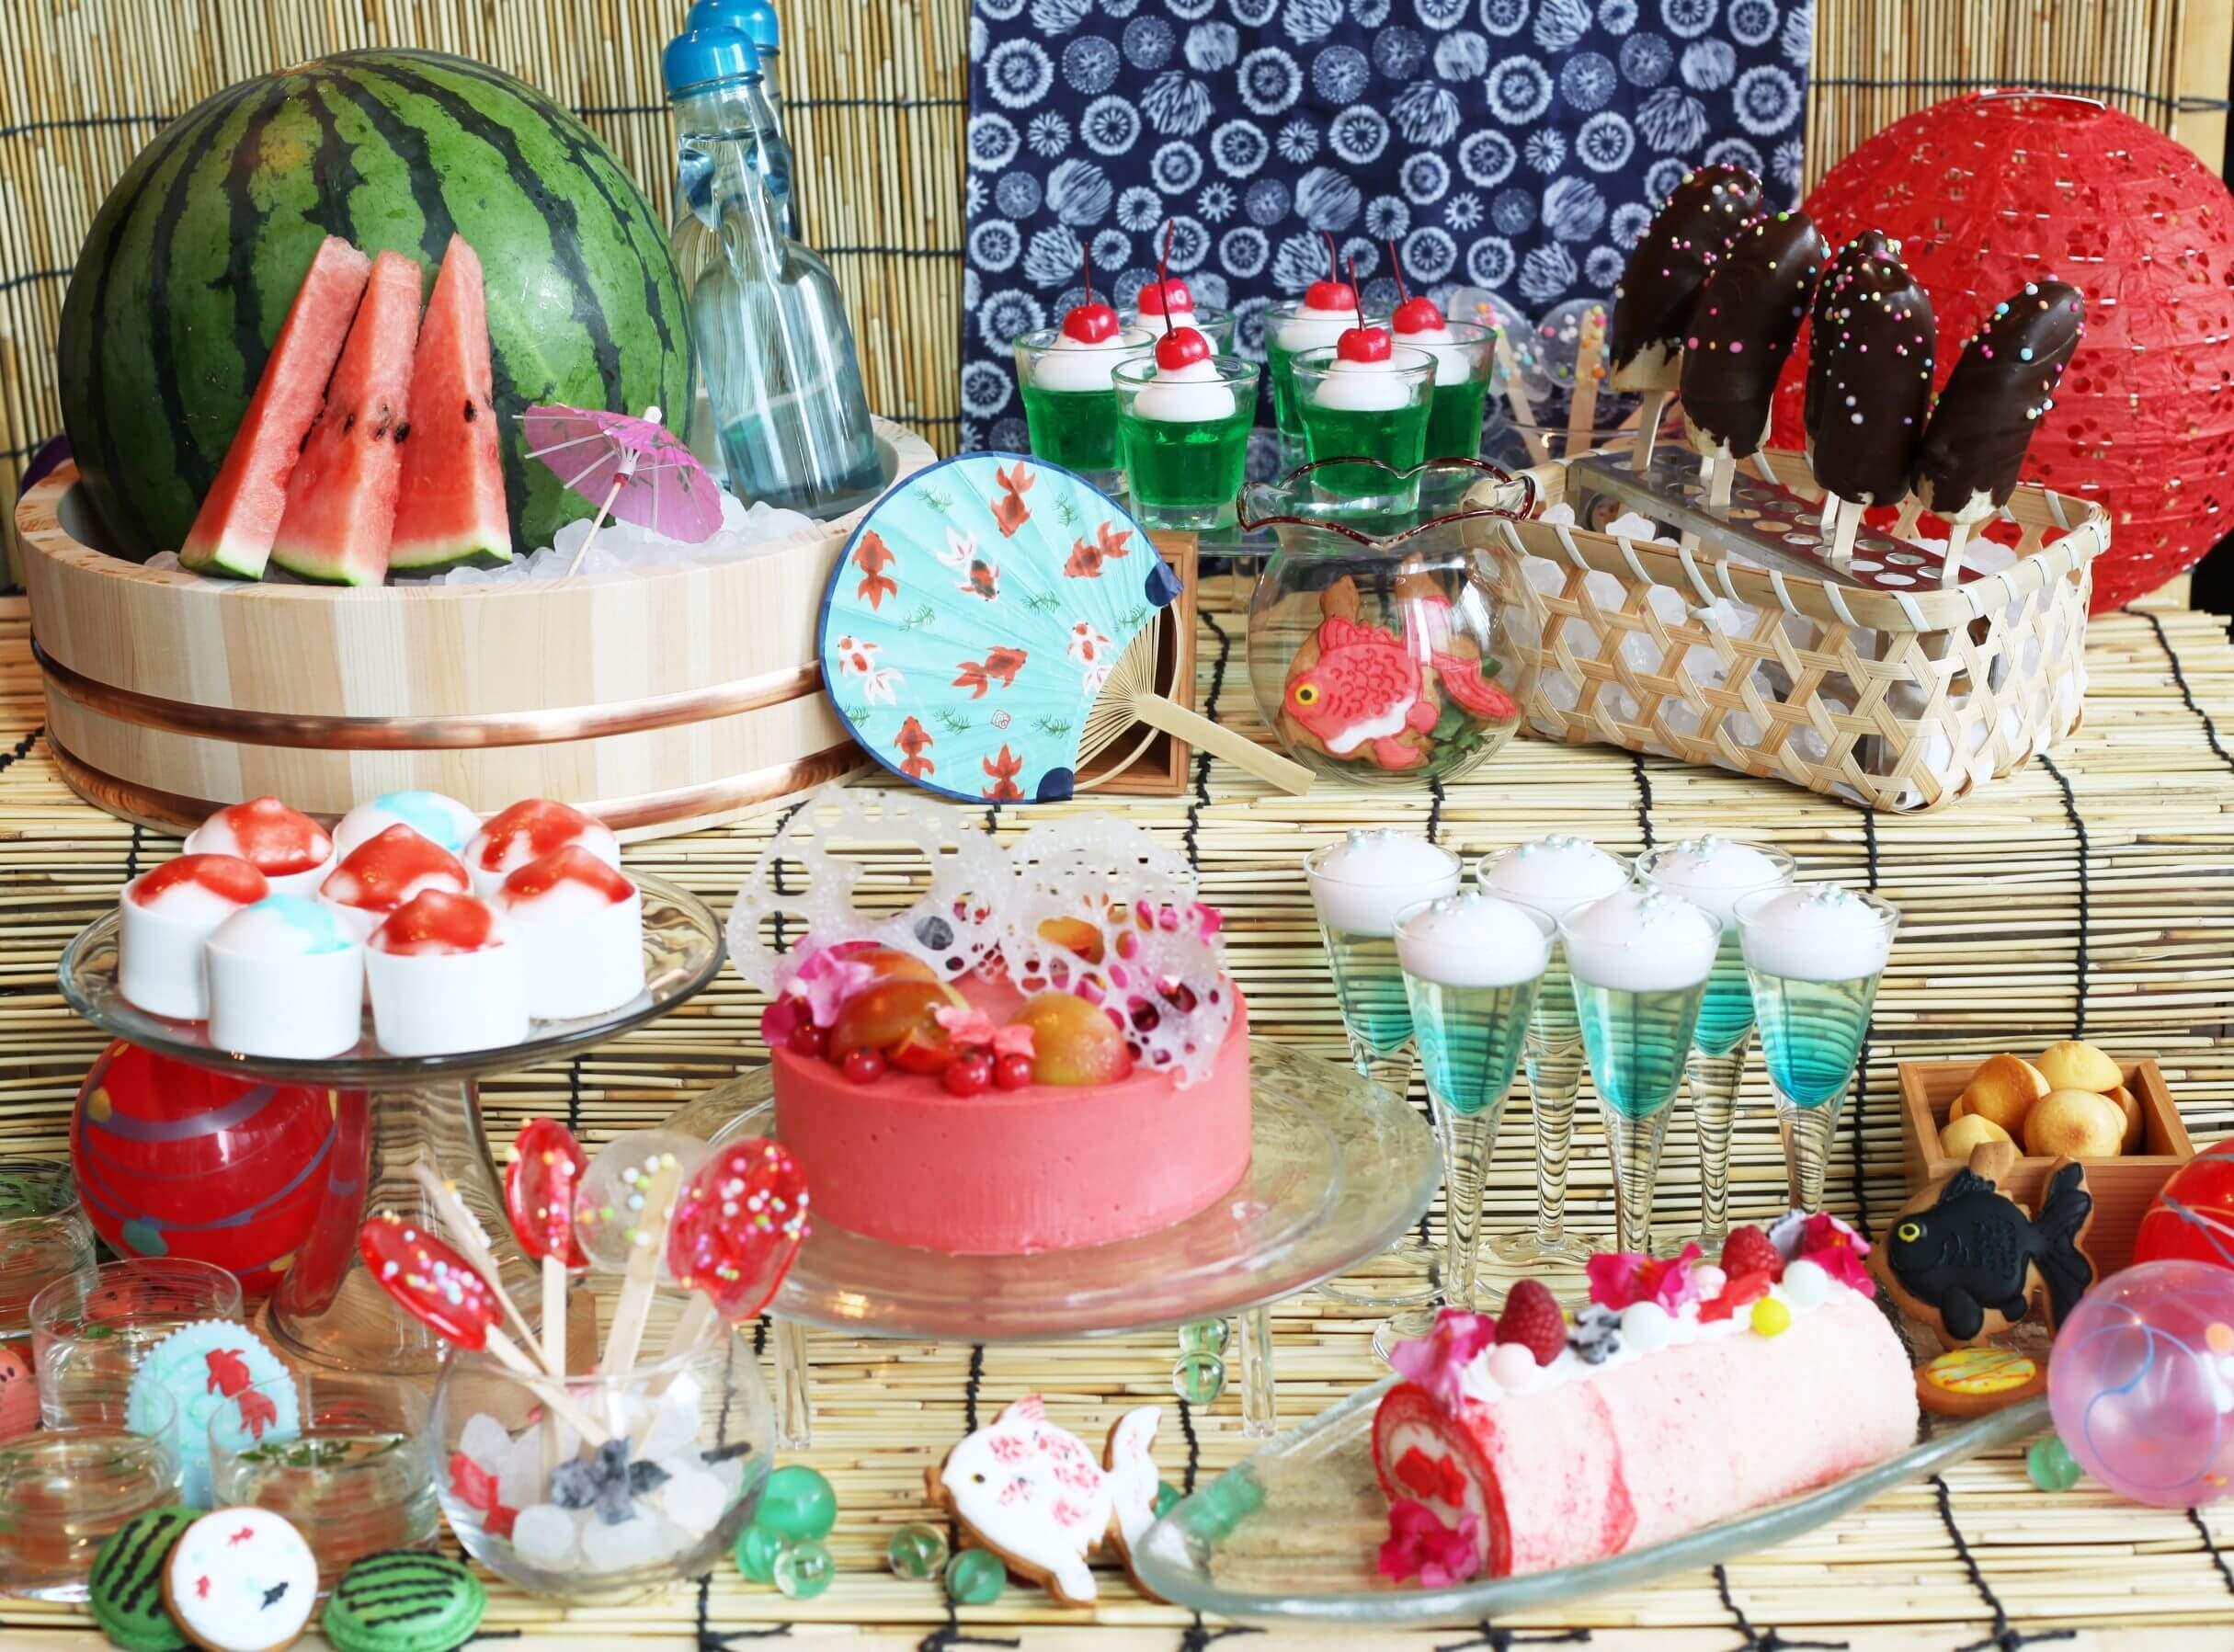 「Summer Sweets Buffet 2018」於餐廳XEX東京・名古屋・大阪舉辦 在名古屋、在大阪、在東京、餐廳、